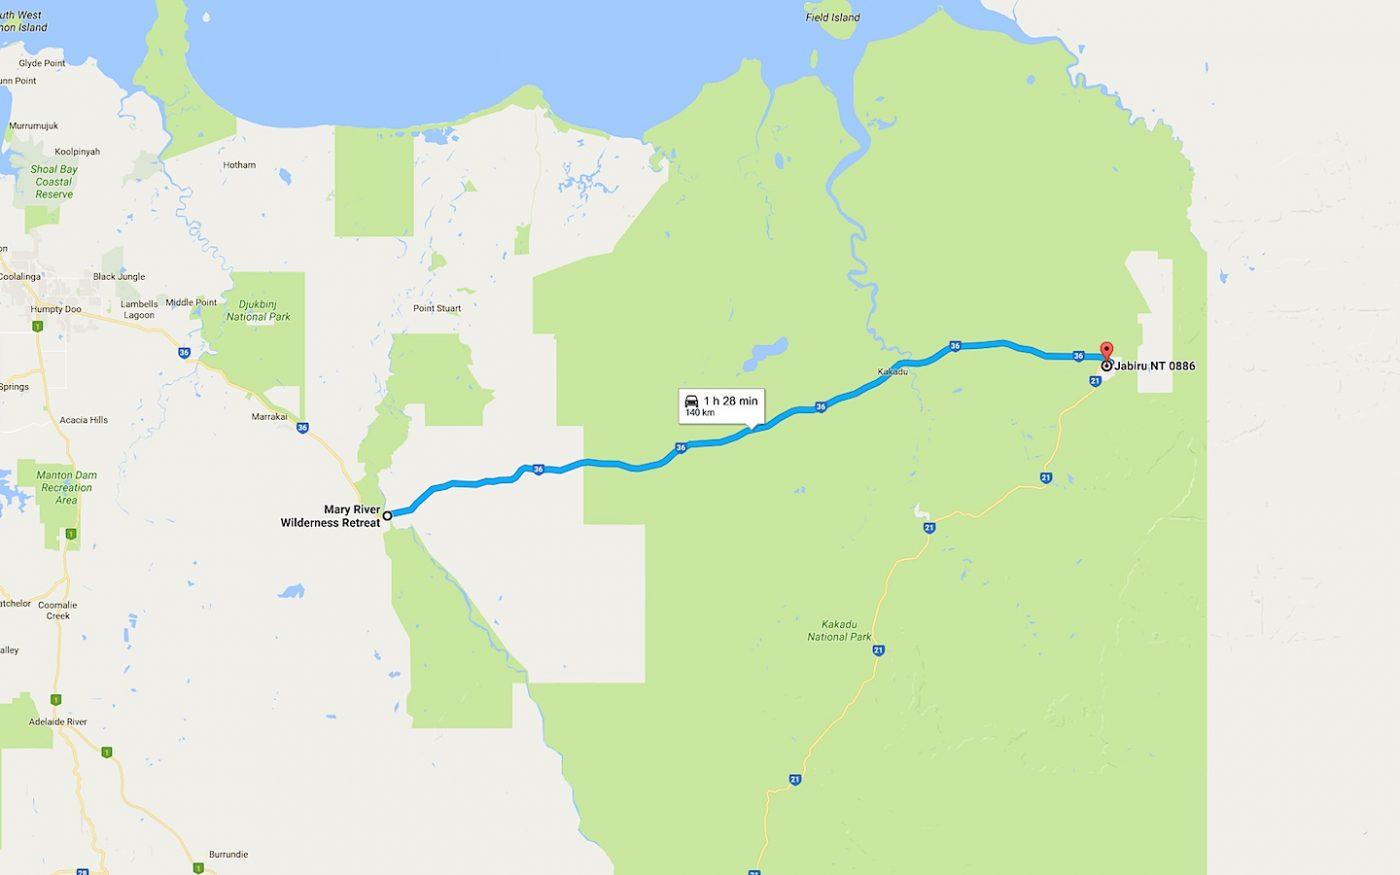 Mary River - Jabiru